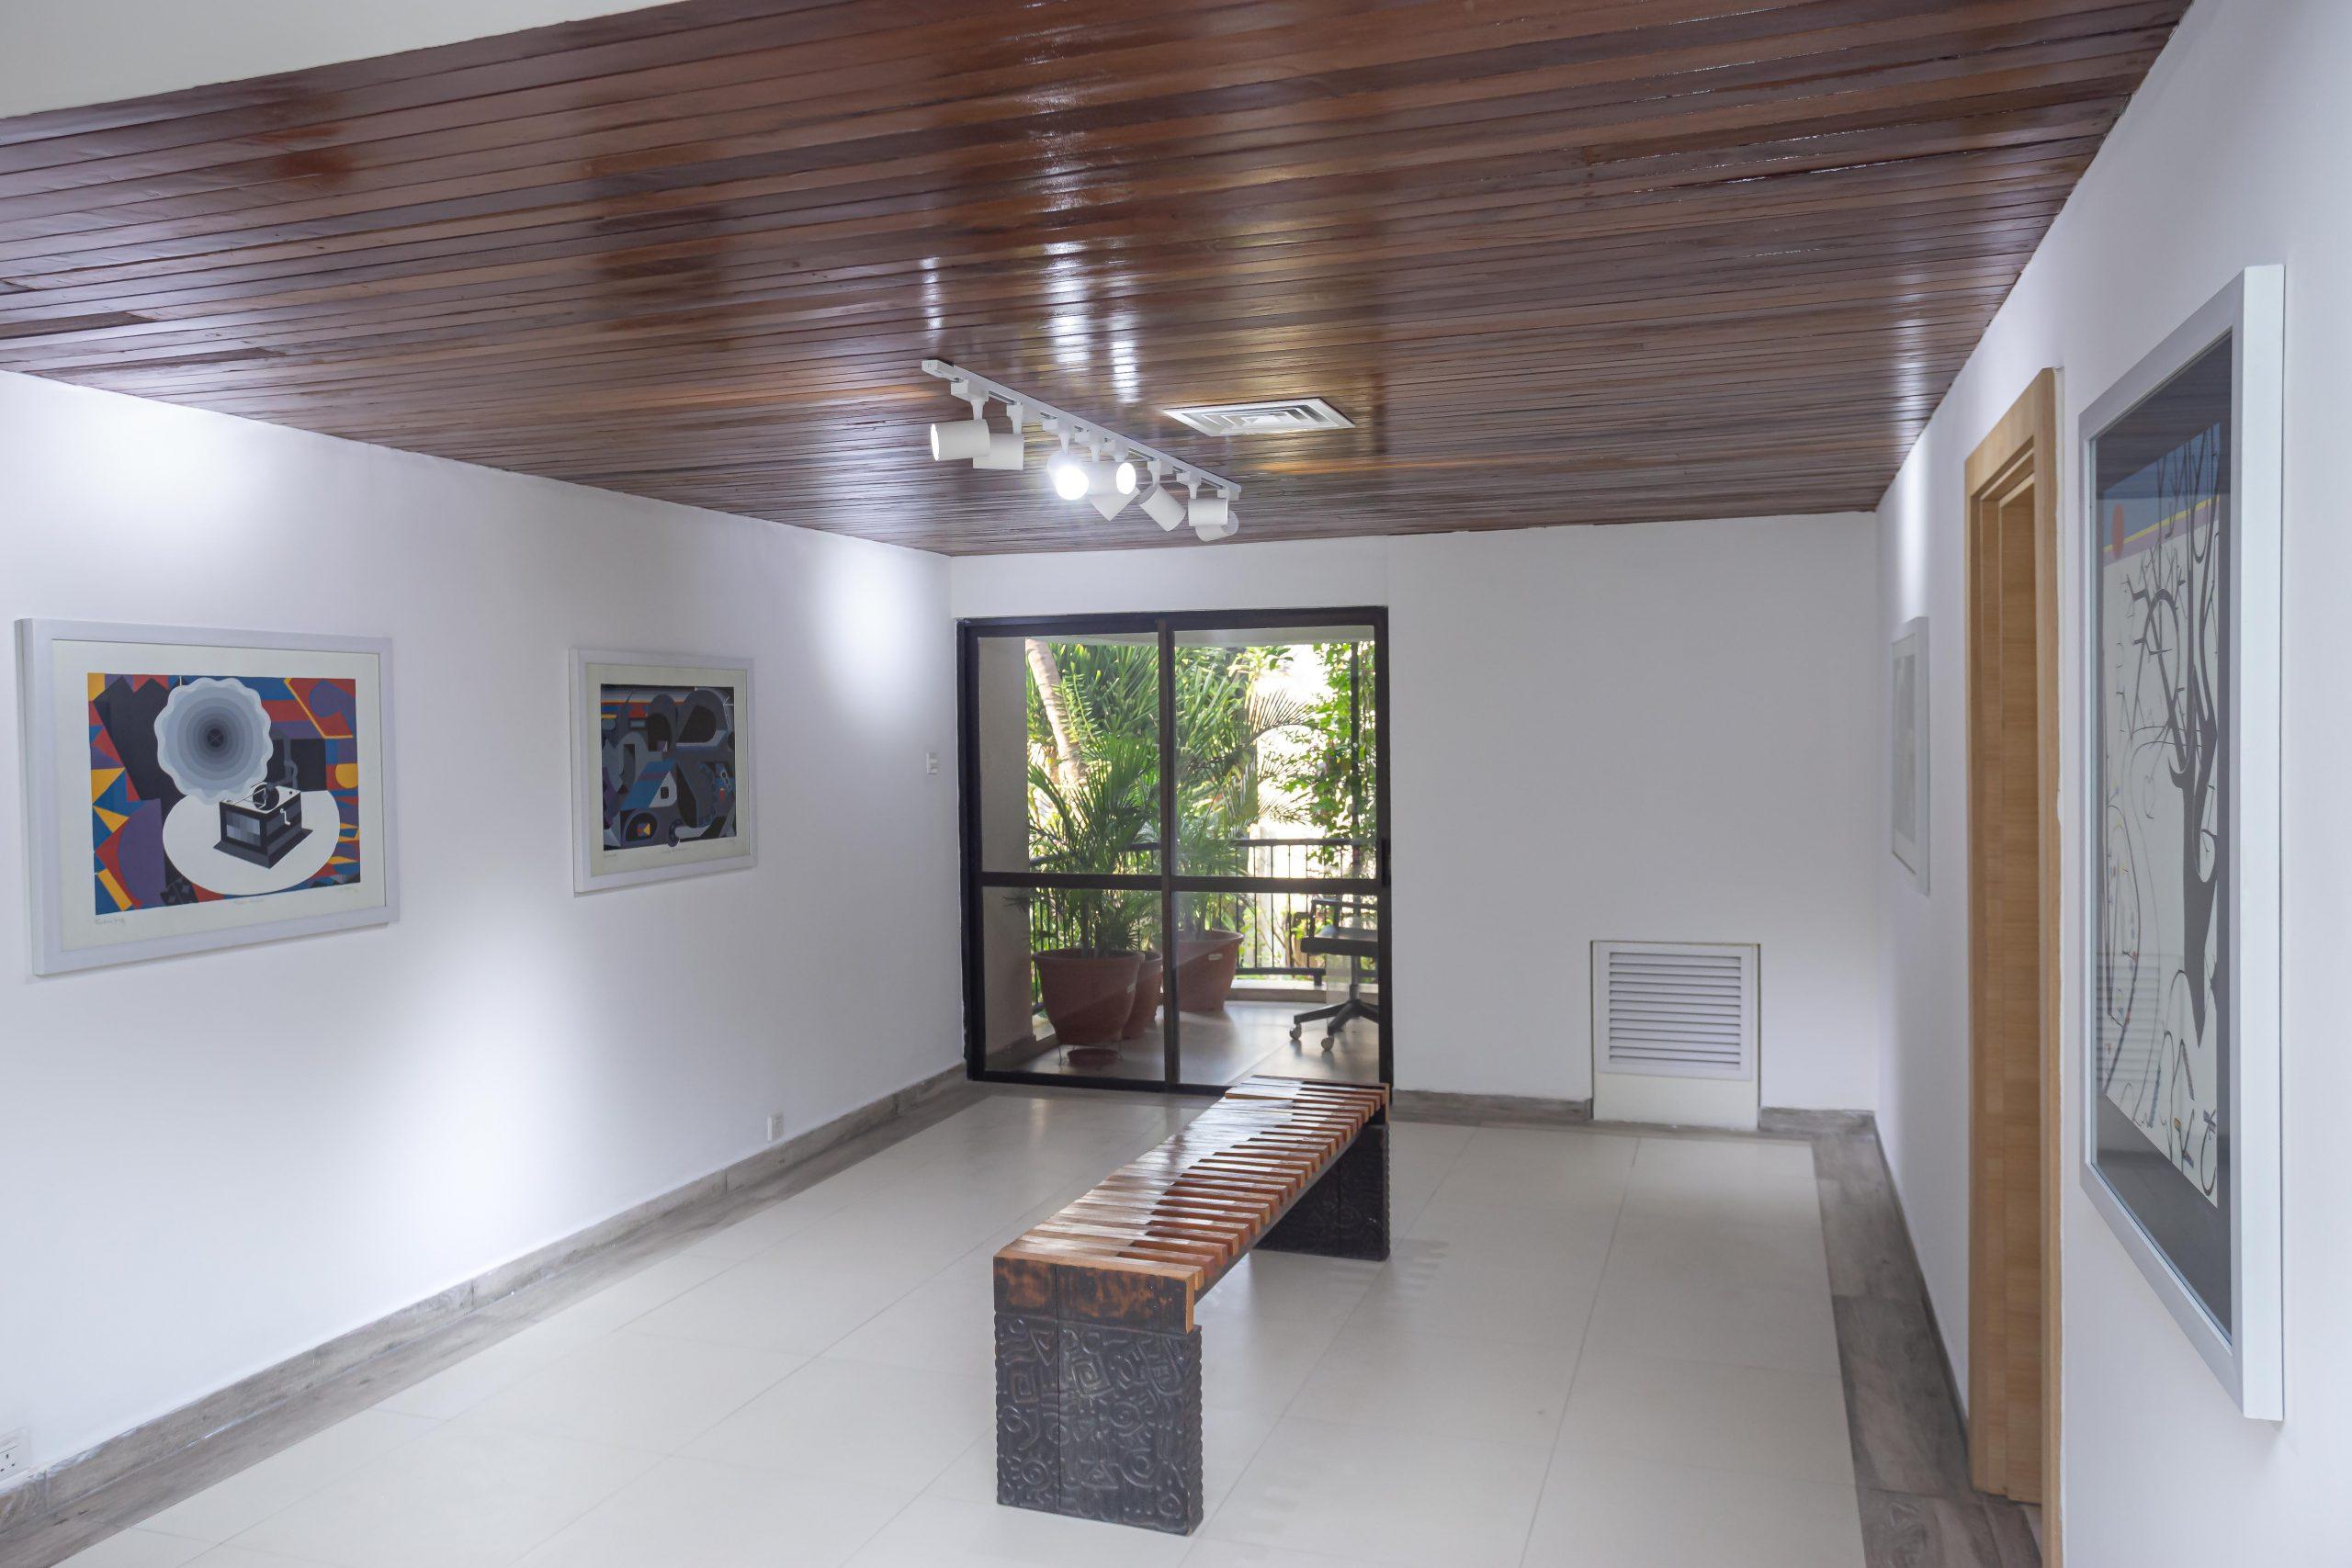 Installation view: Uzo Egonu's Prints at Kó art space in Lagos. Courtesy of Kó